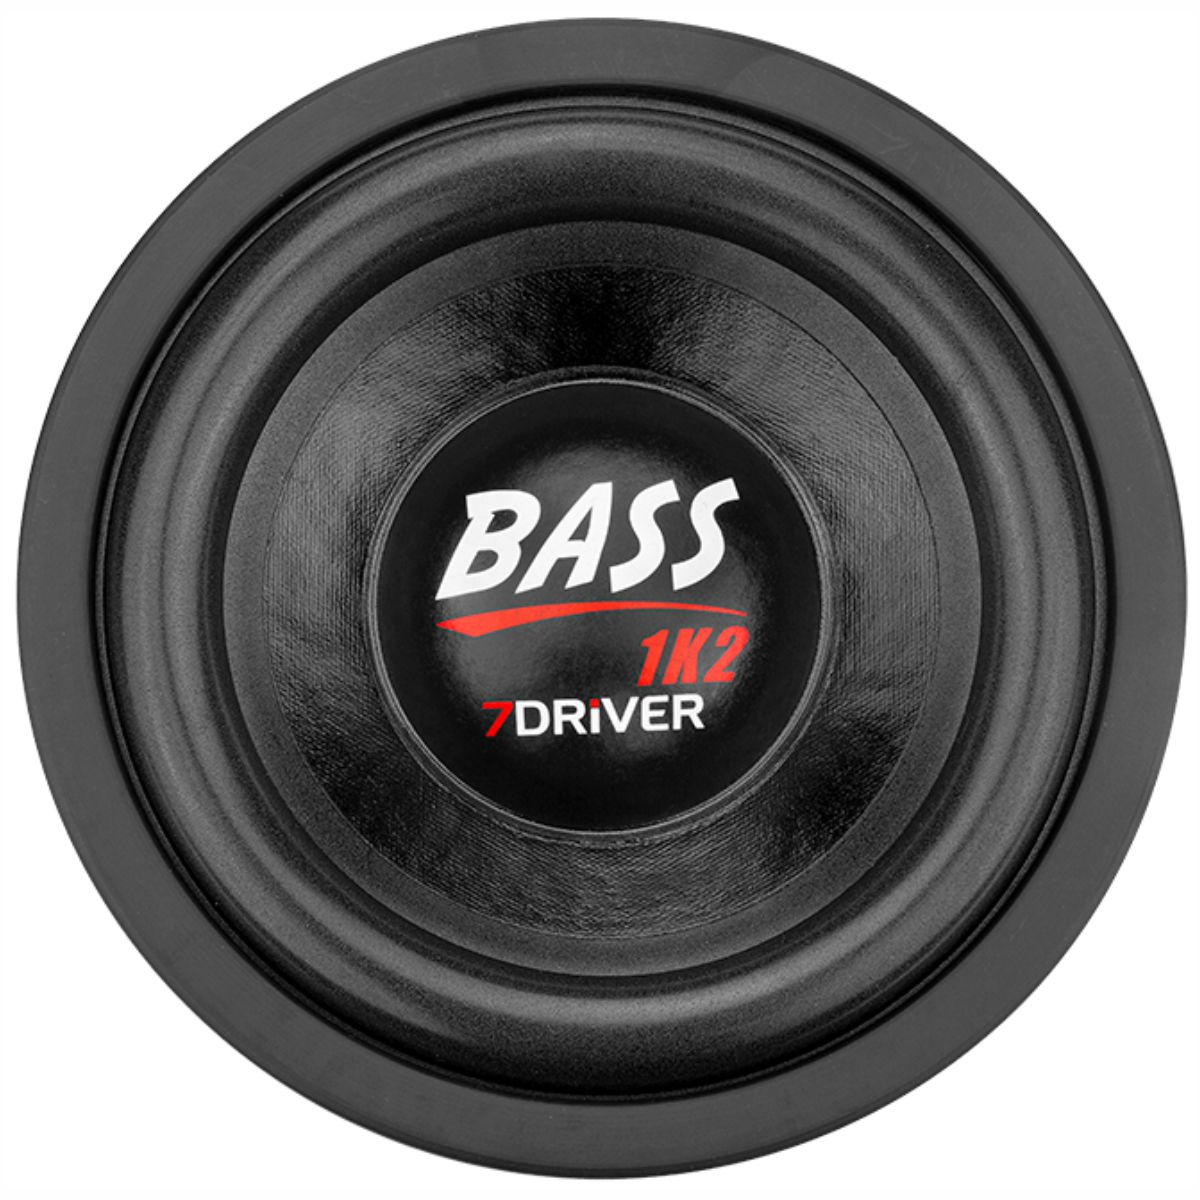 "Alto Falante Subwoofer 7Driver 8"" Bass 1K2 600W RMS 4+4 Ohms"